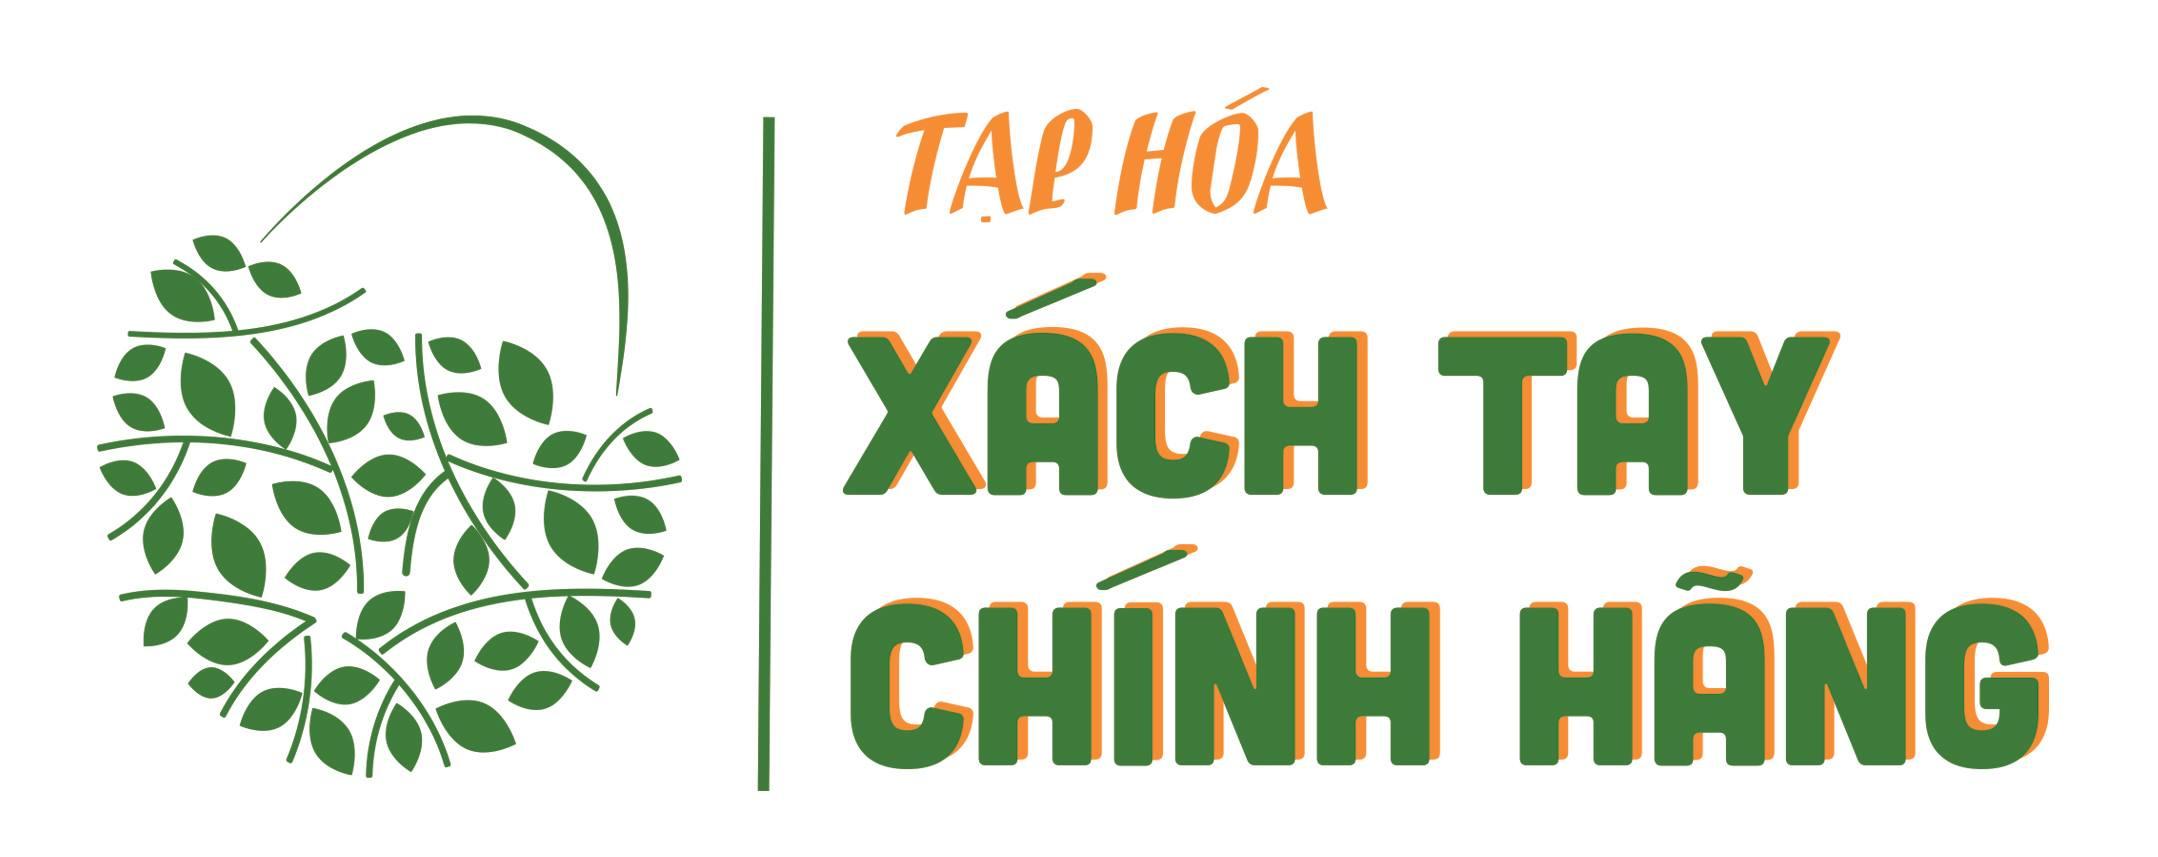 taphoaxachtaychinhhang.com